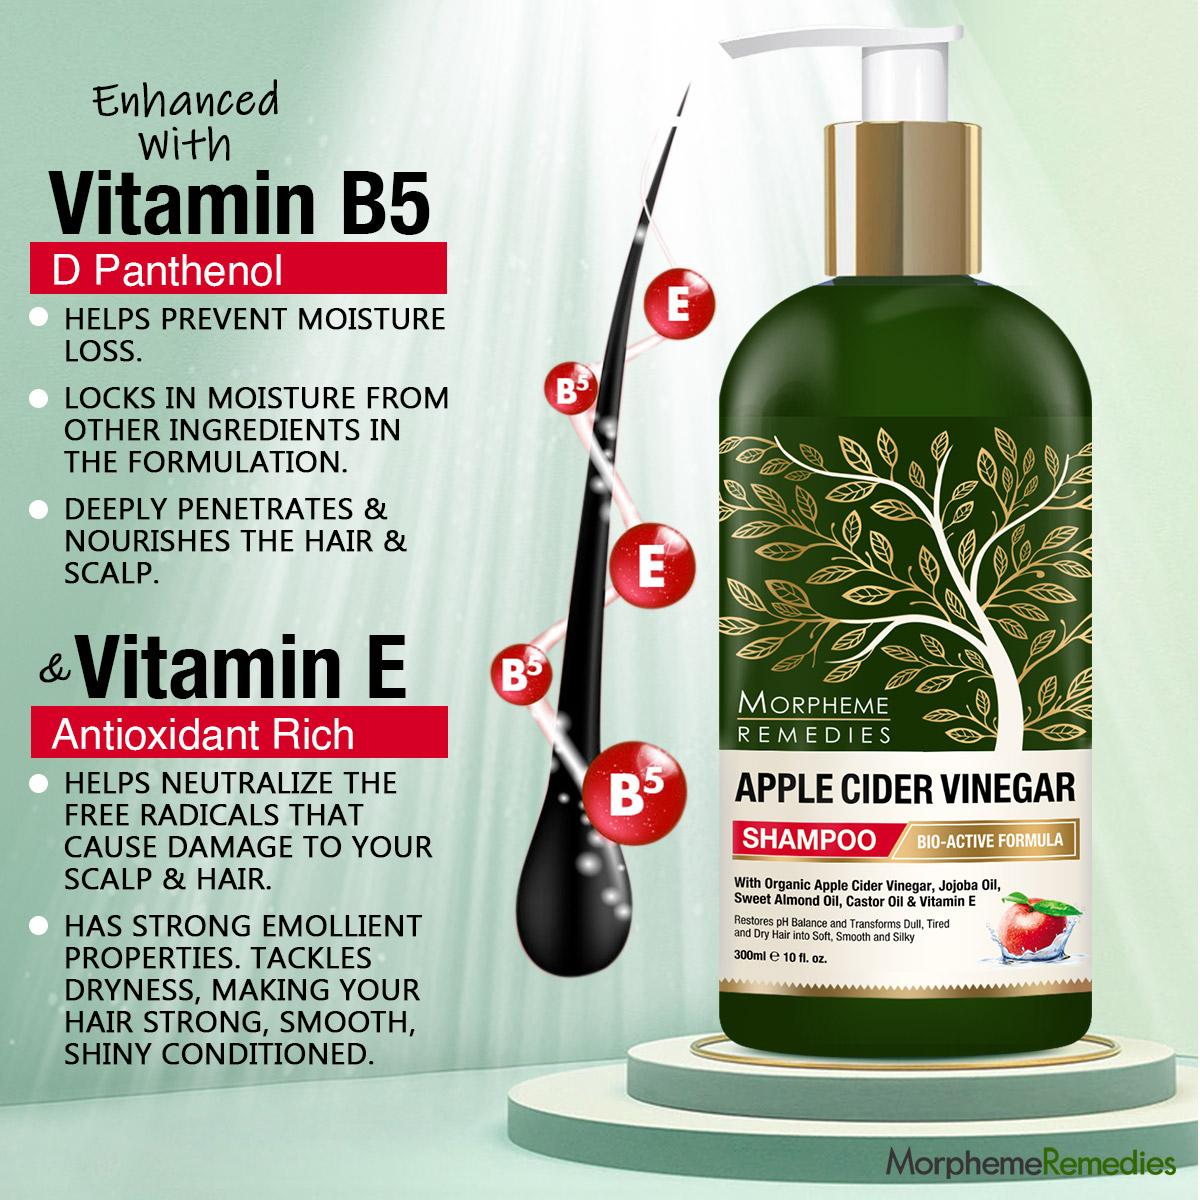 Morpheme Remedies Apple Cider Vinegar Shampoo